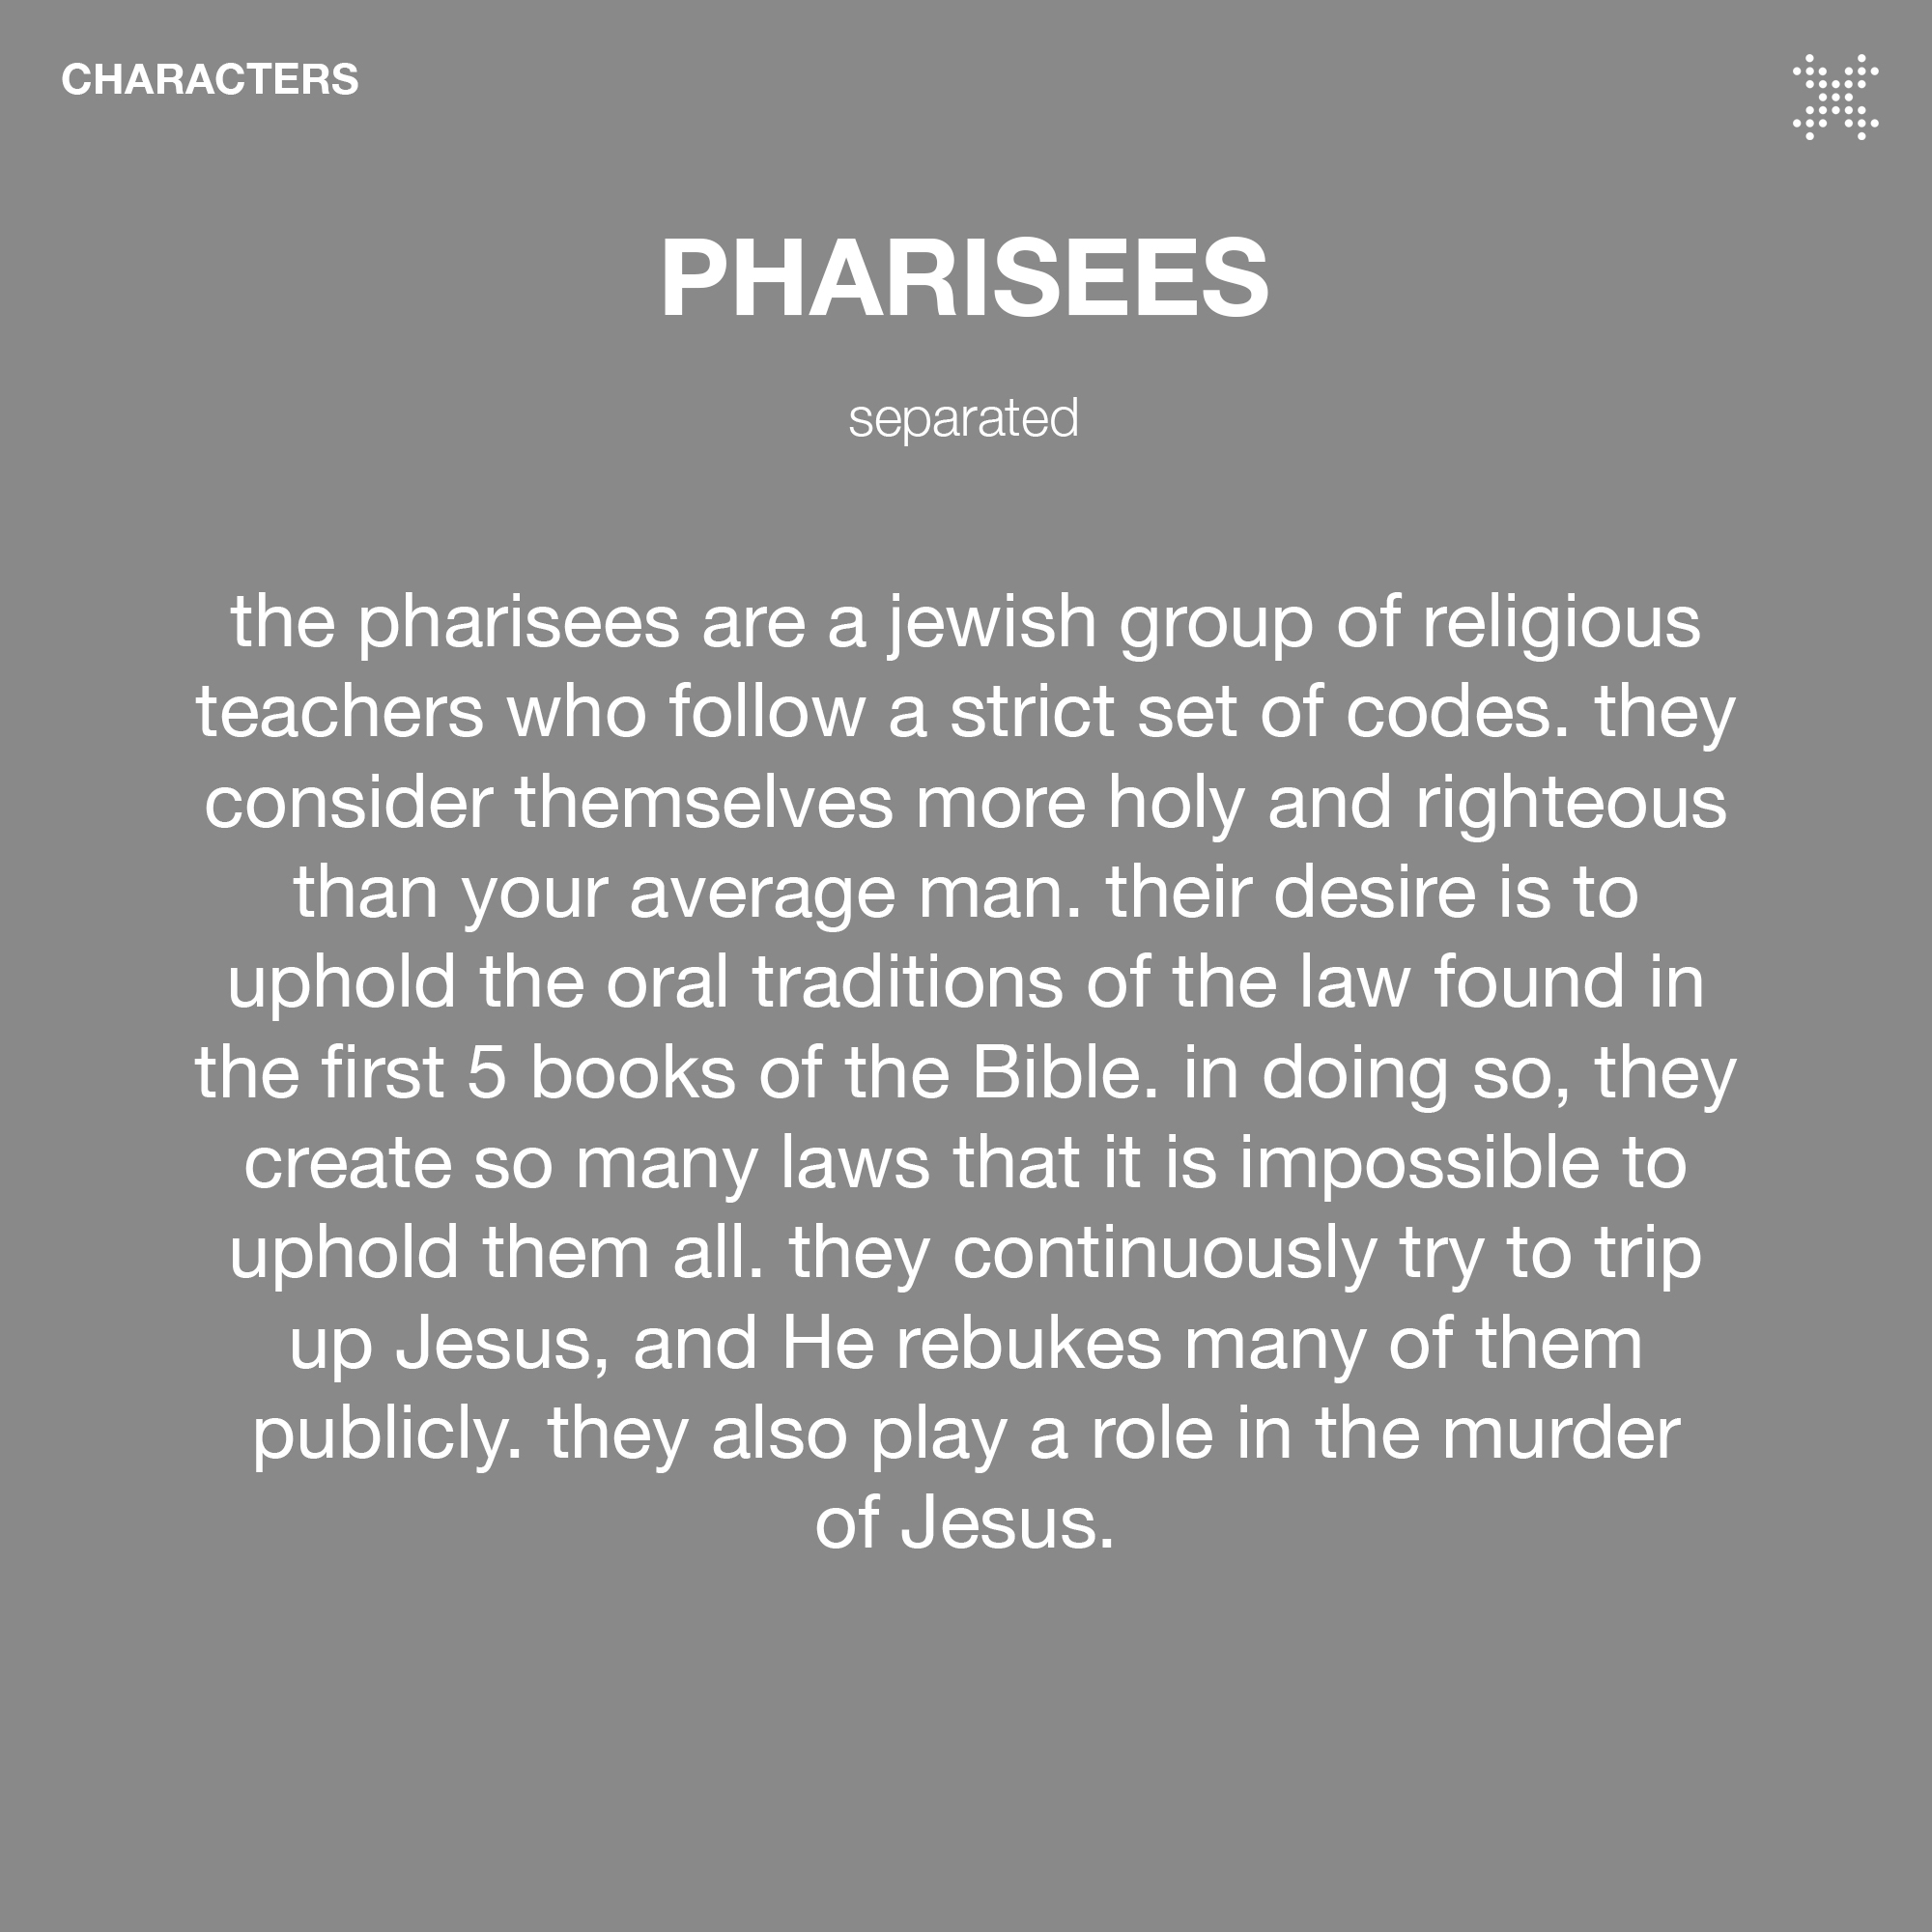 phariseeswc.jpg